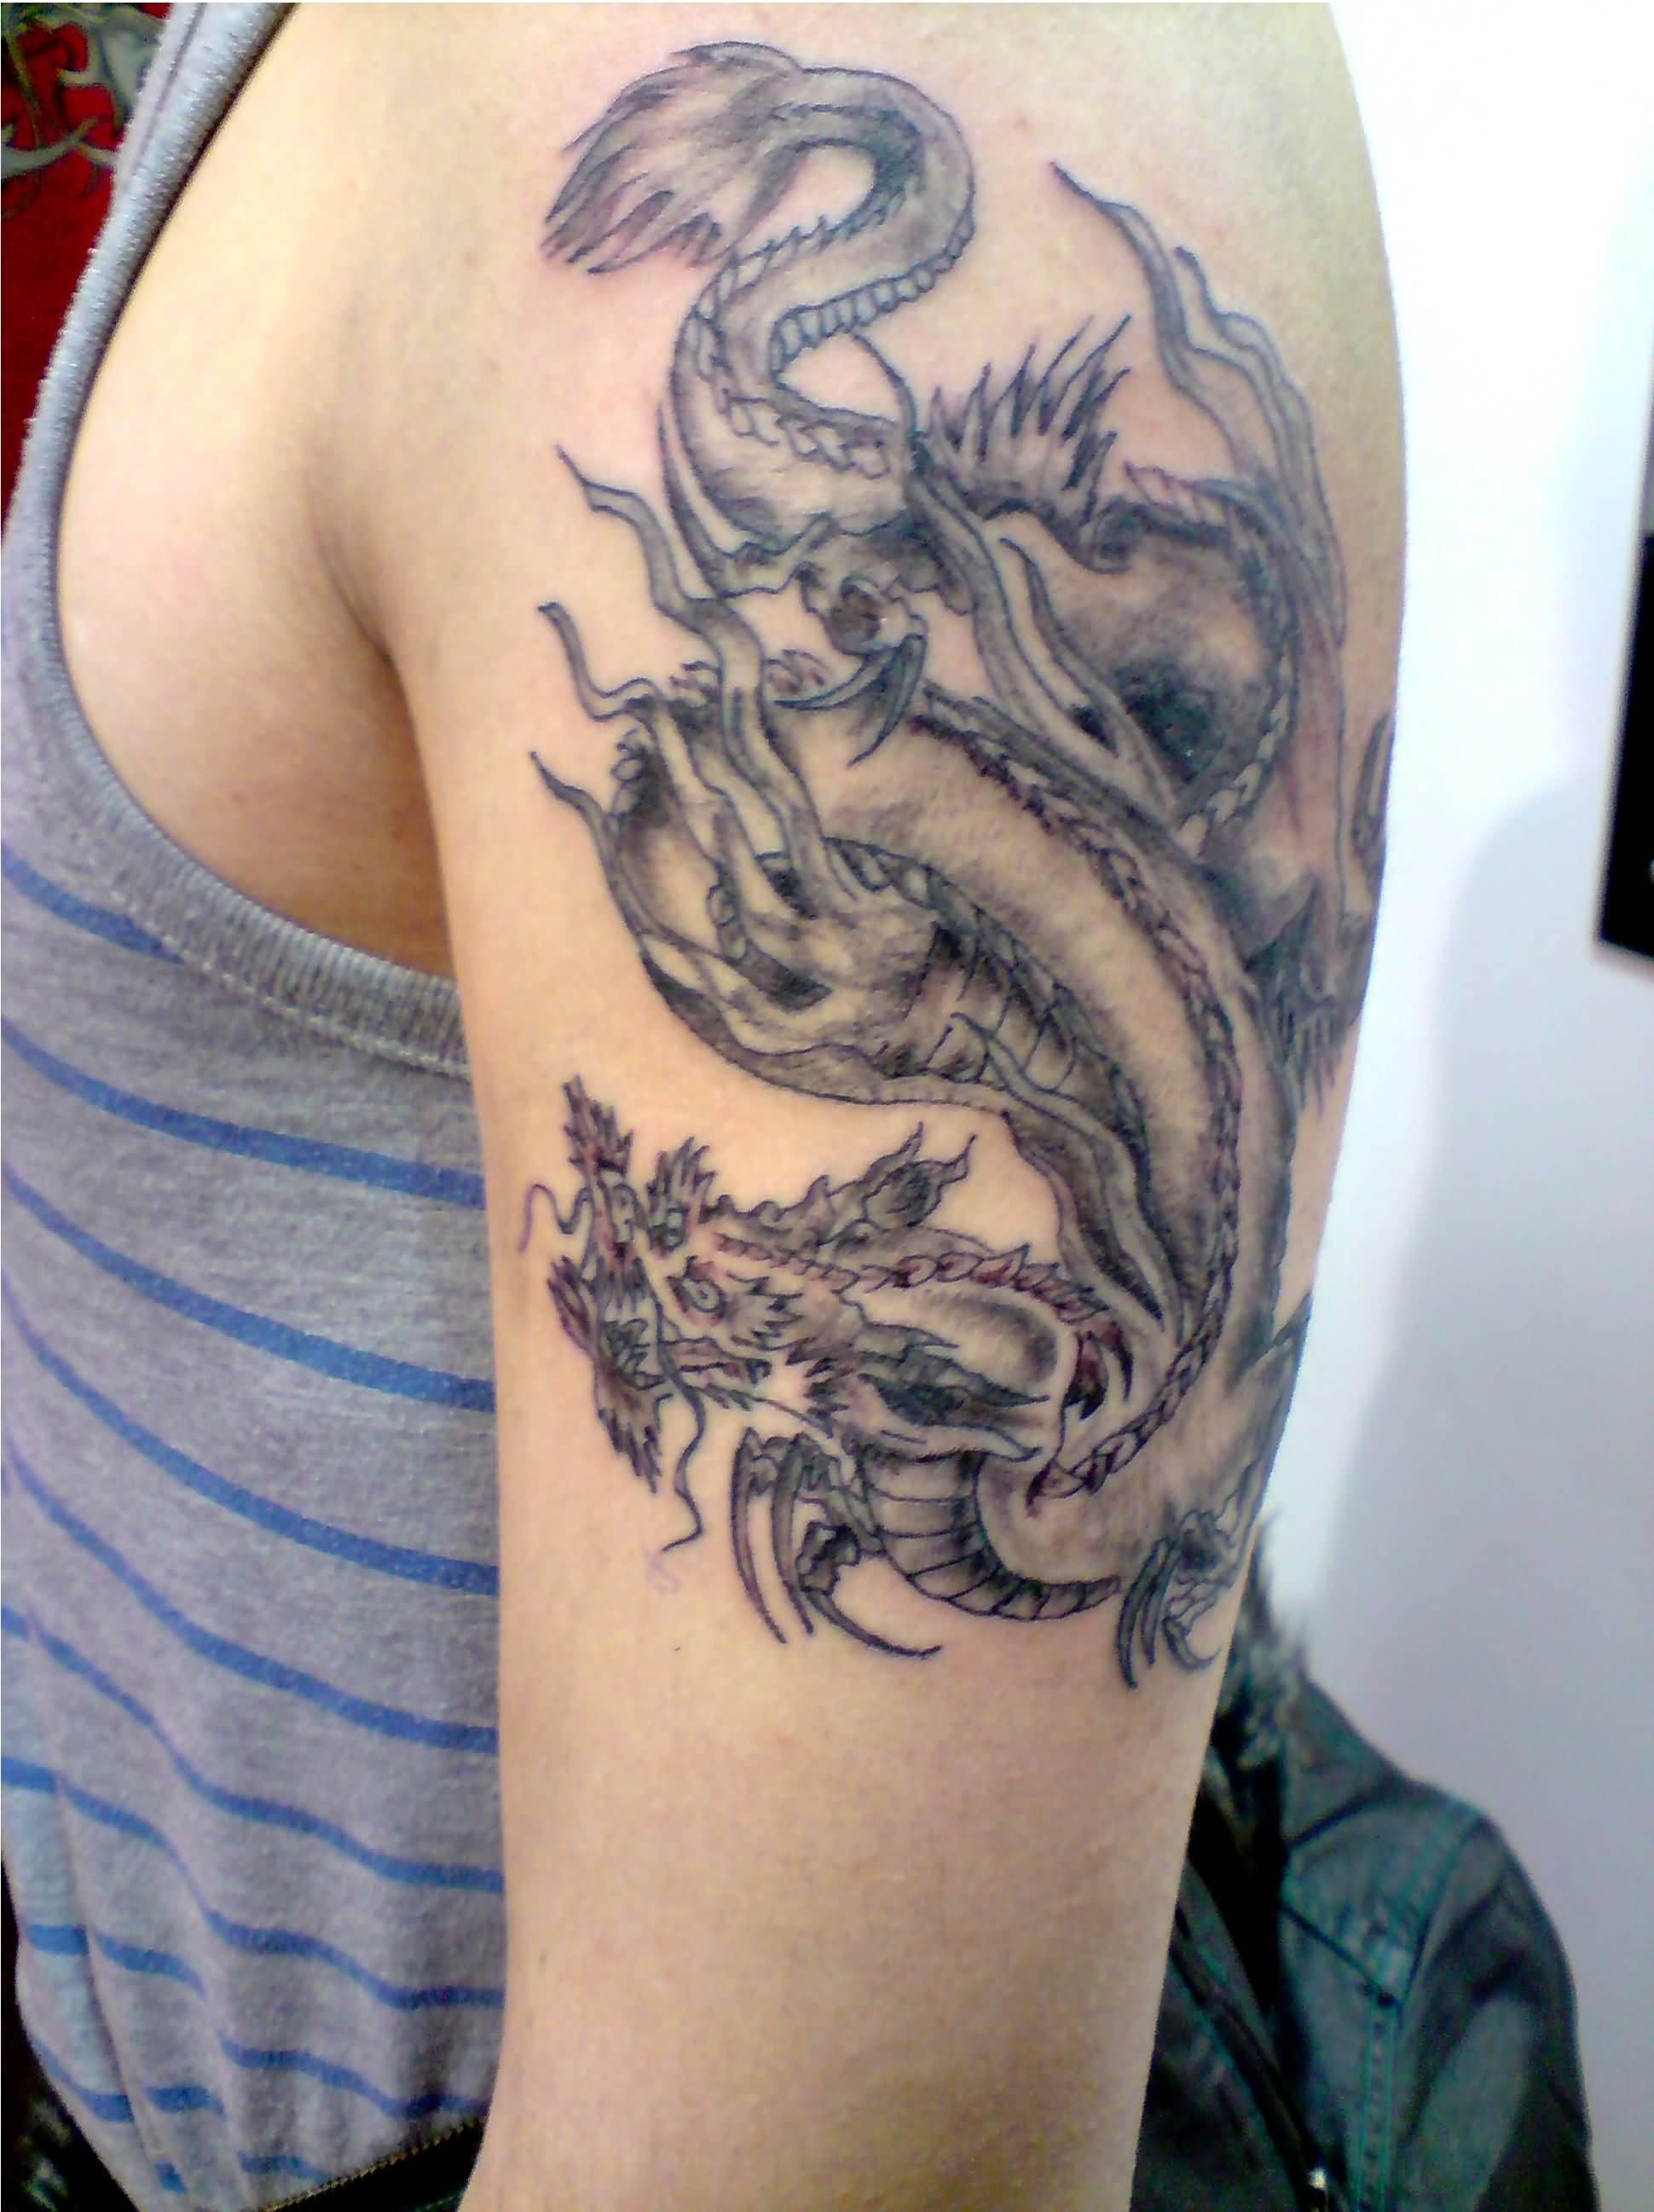 условиям действия тату на руке дракон фото грибной мякоти